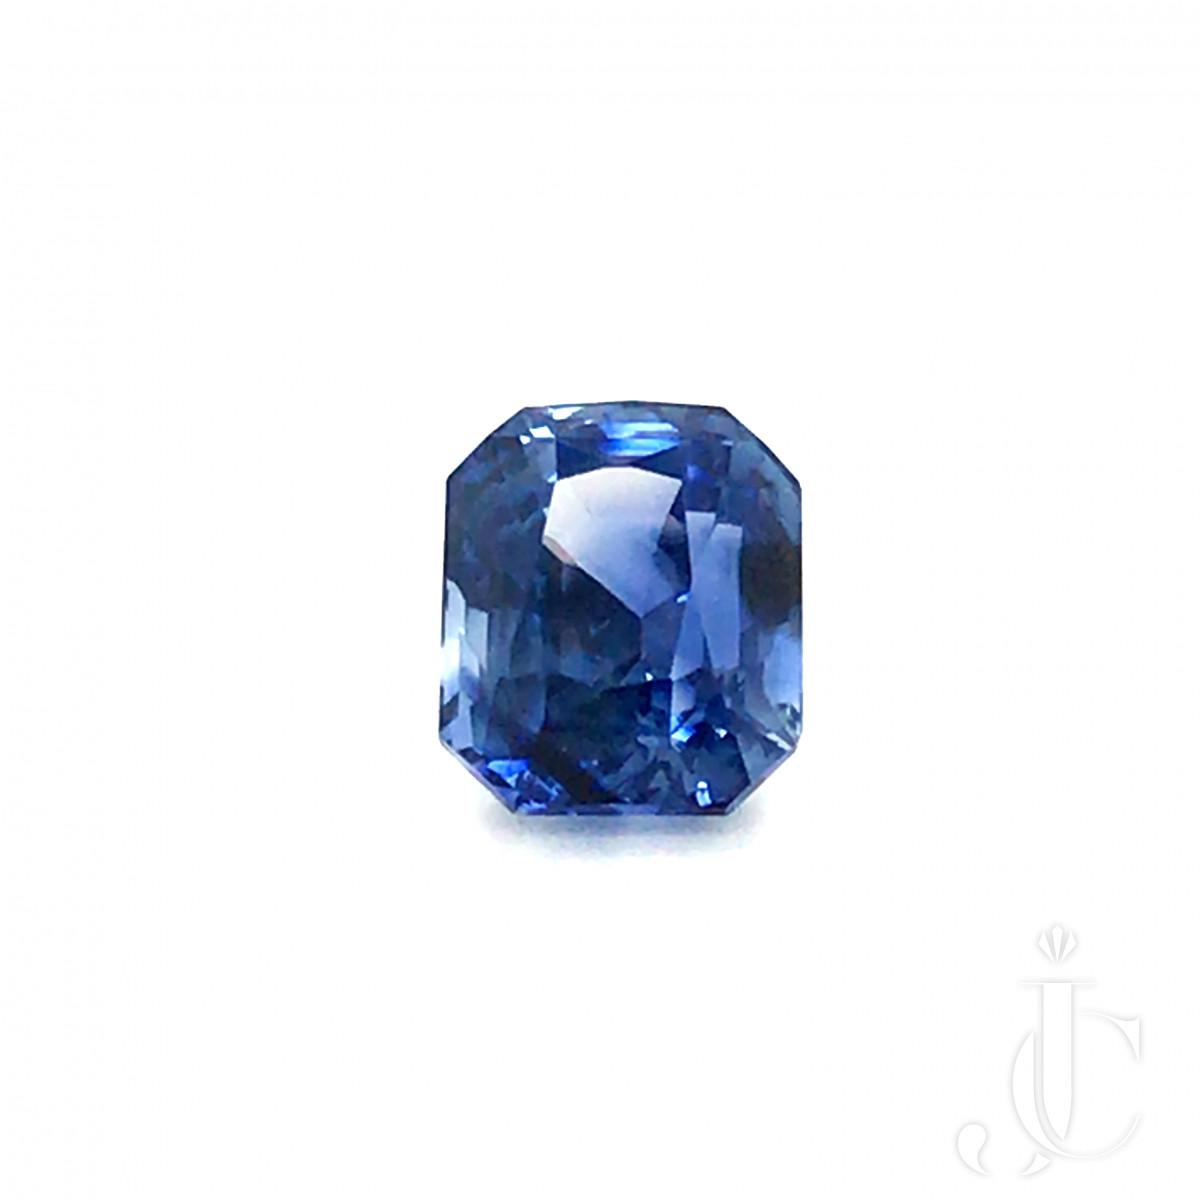 Natural no heat octagon Ceylon Sapphire 9.30ct blue with FGL lab report